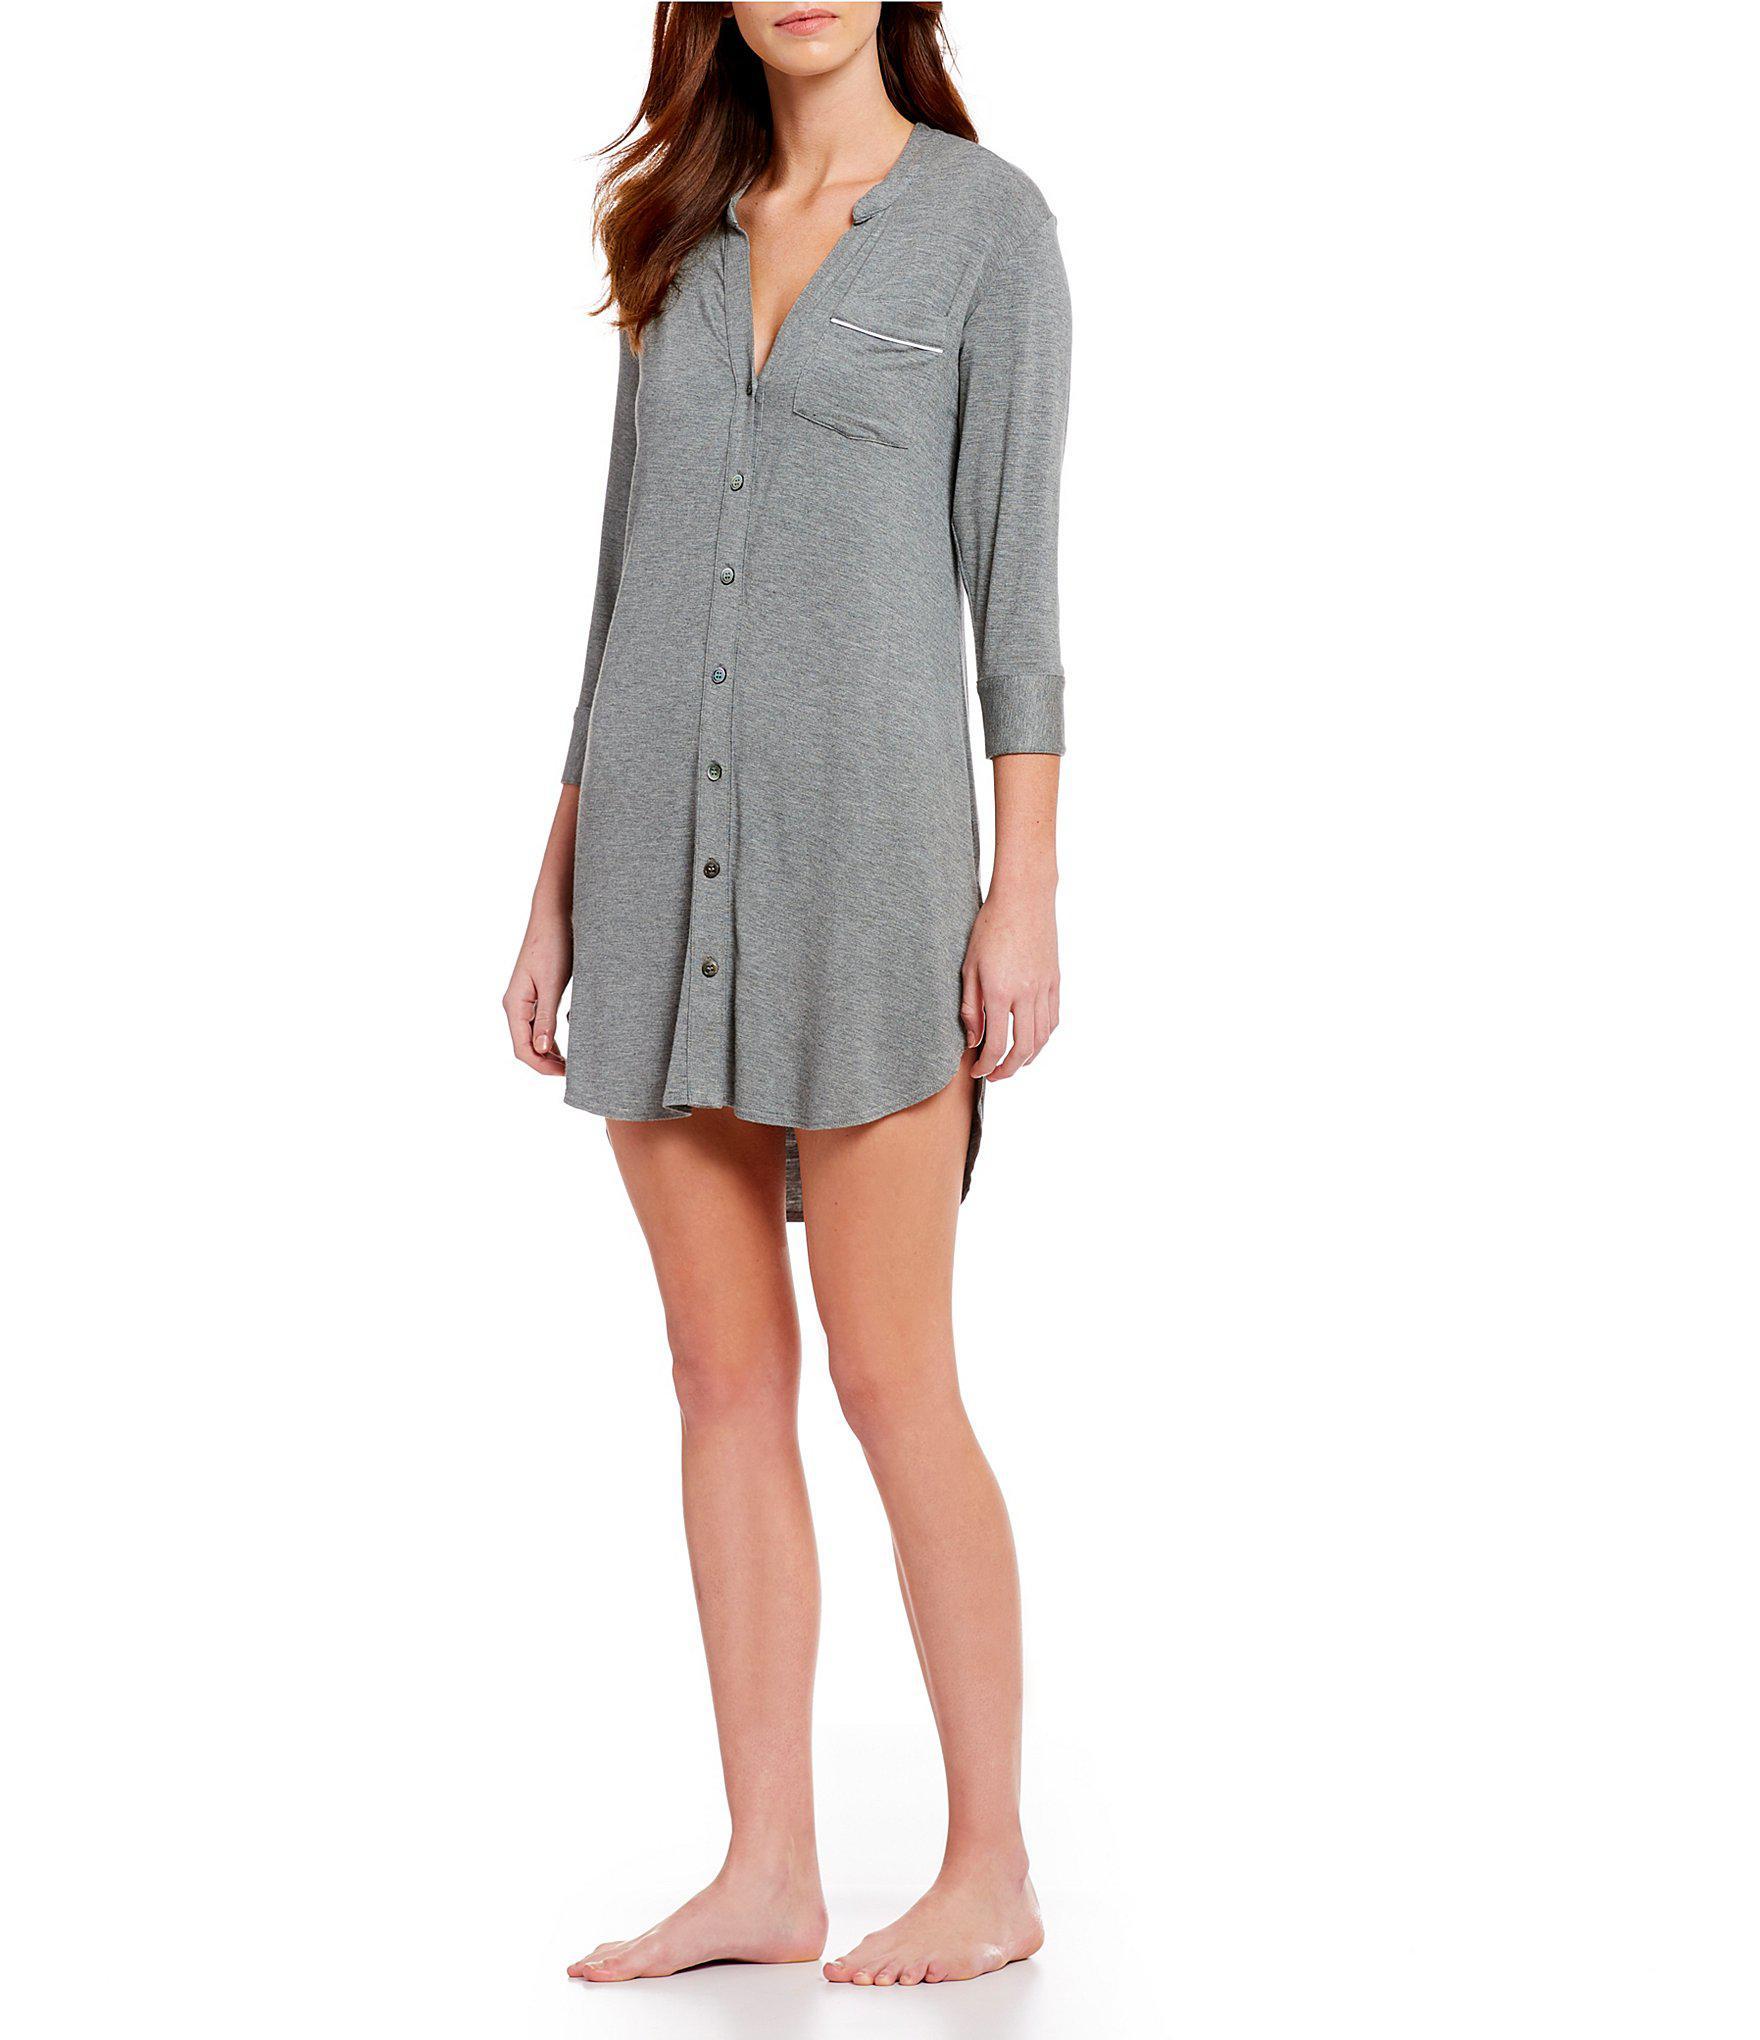 2b4347bcd2 Lyst - Ugg Vivian Solid Knit Sleep Shirt in Gray